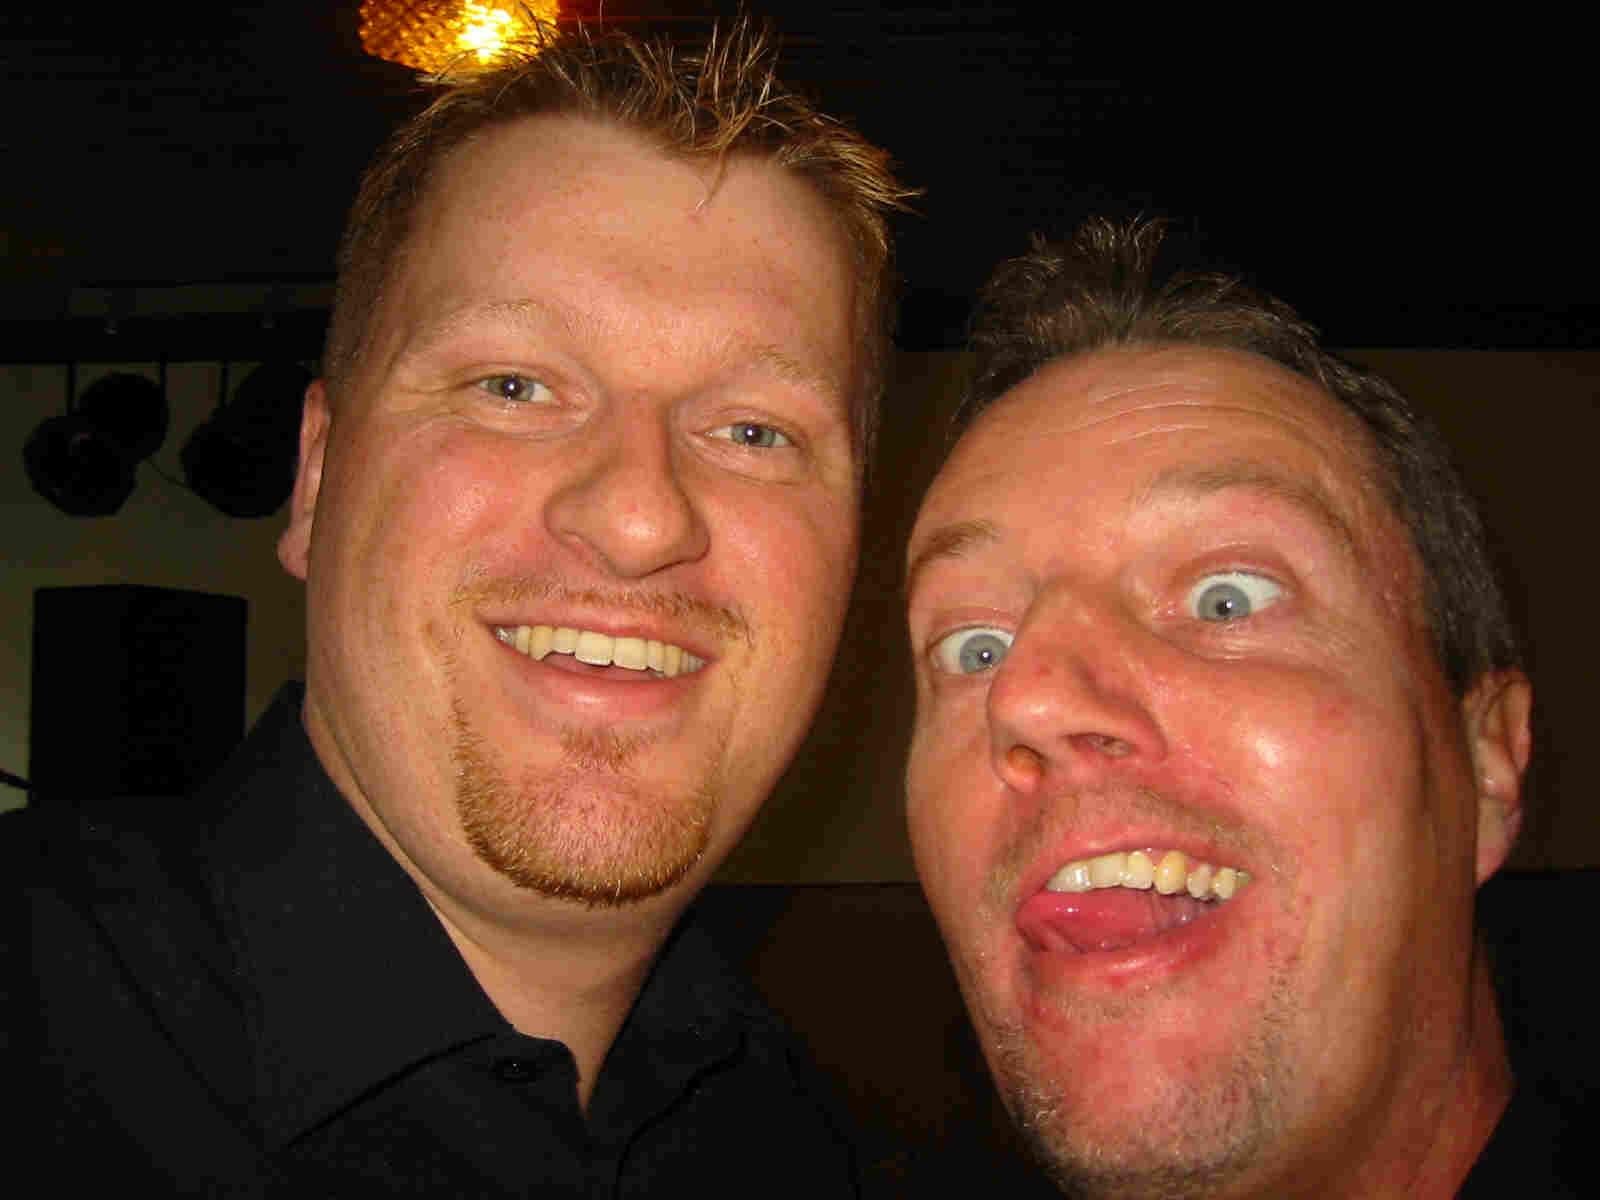 Dobbel-selfieeeee....